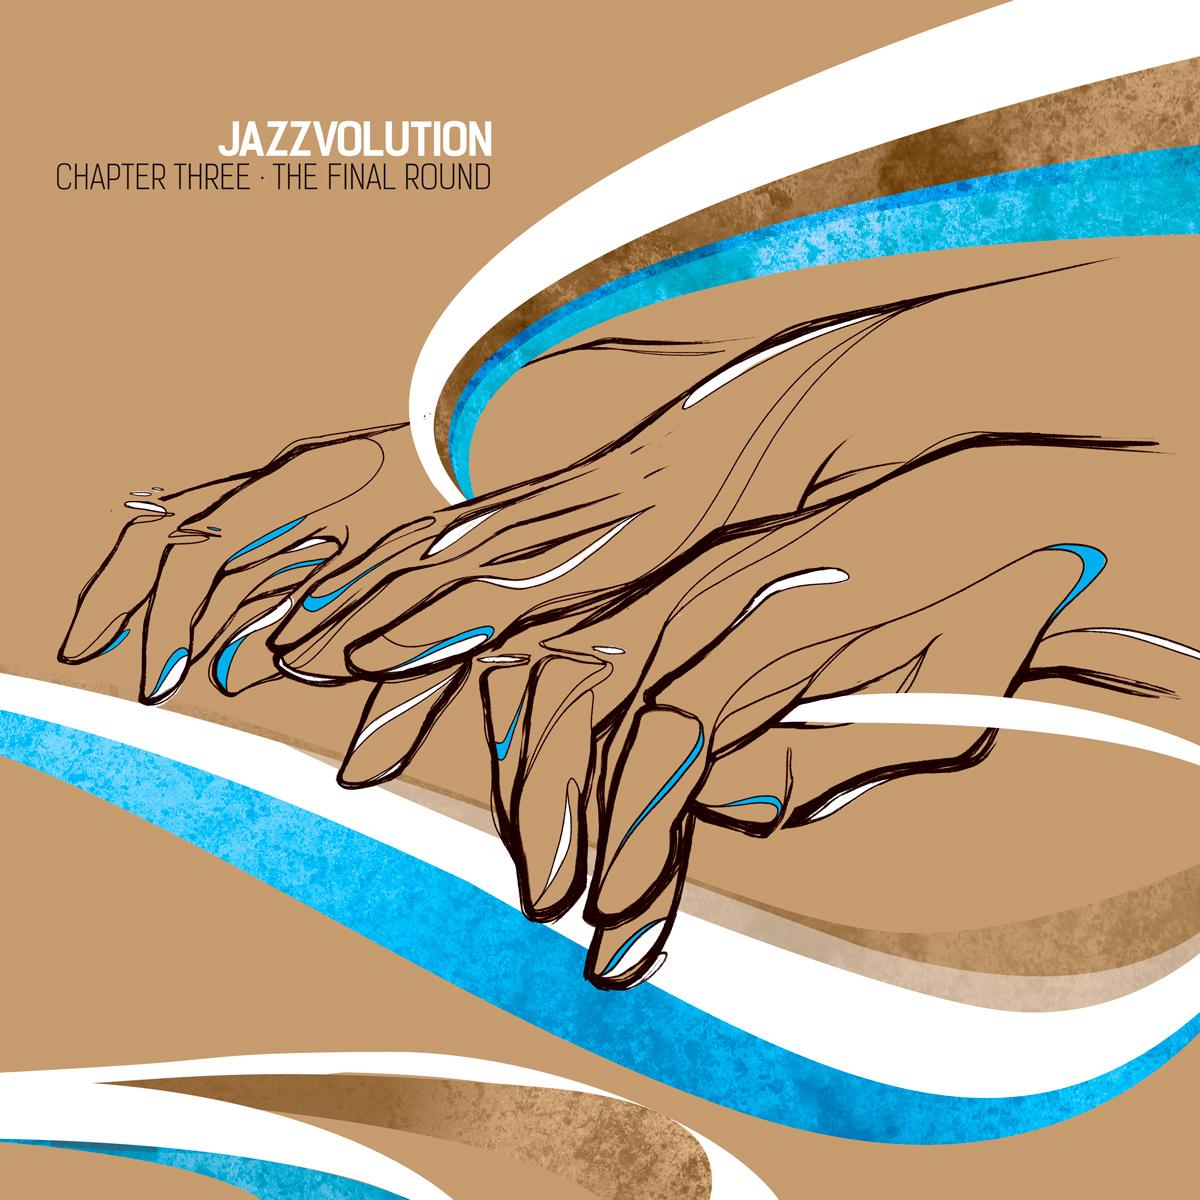 Jazzvolution Chapter Three: The Final Round (LP / Digital by The Find x HHV)